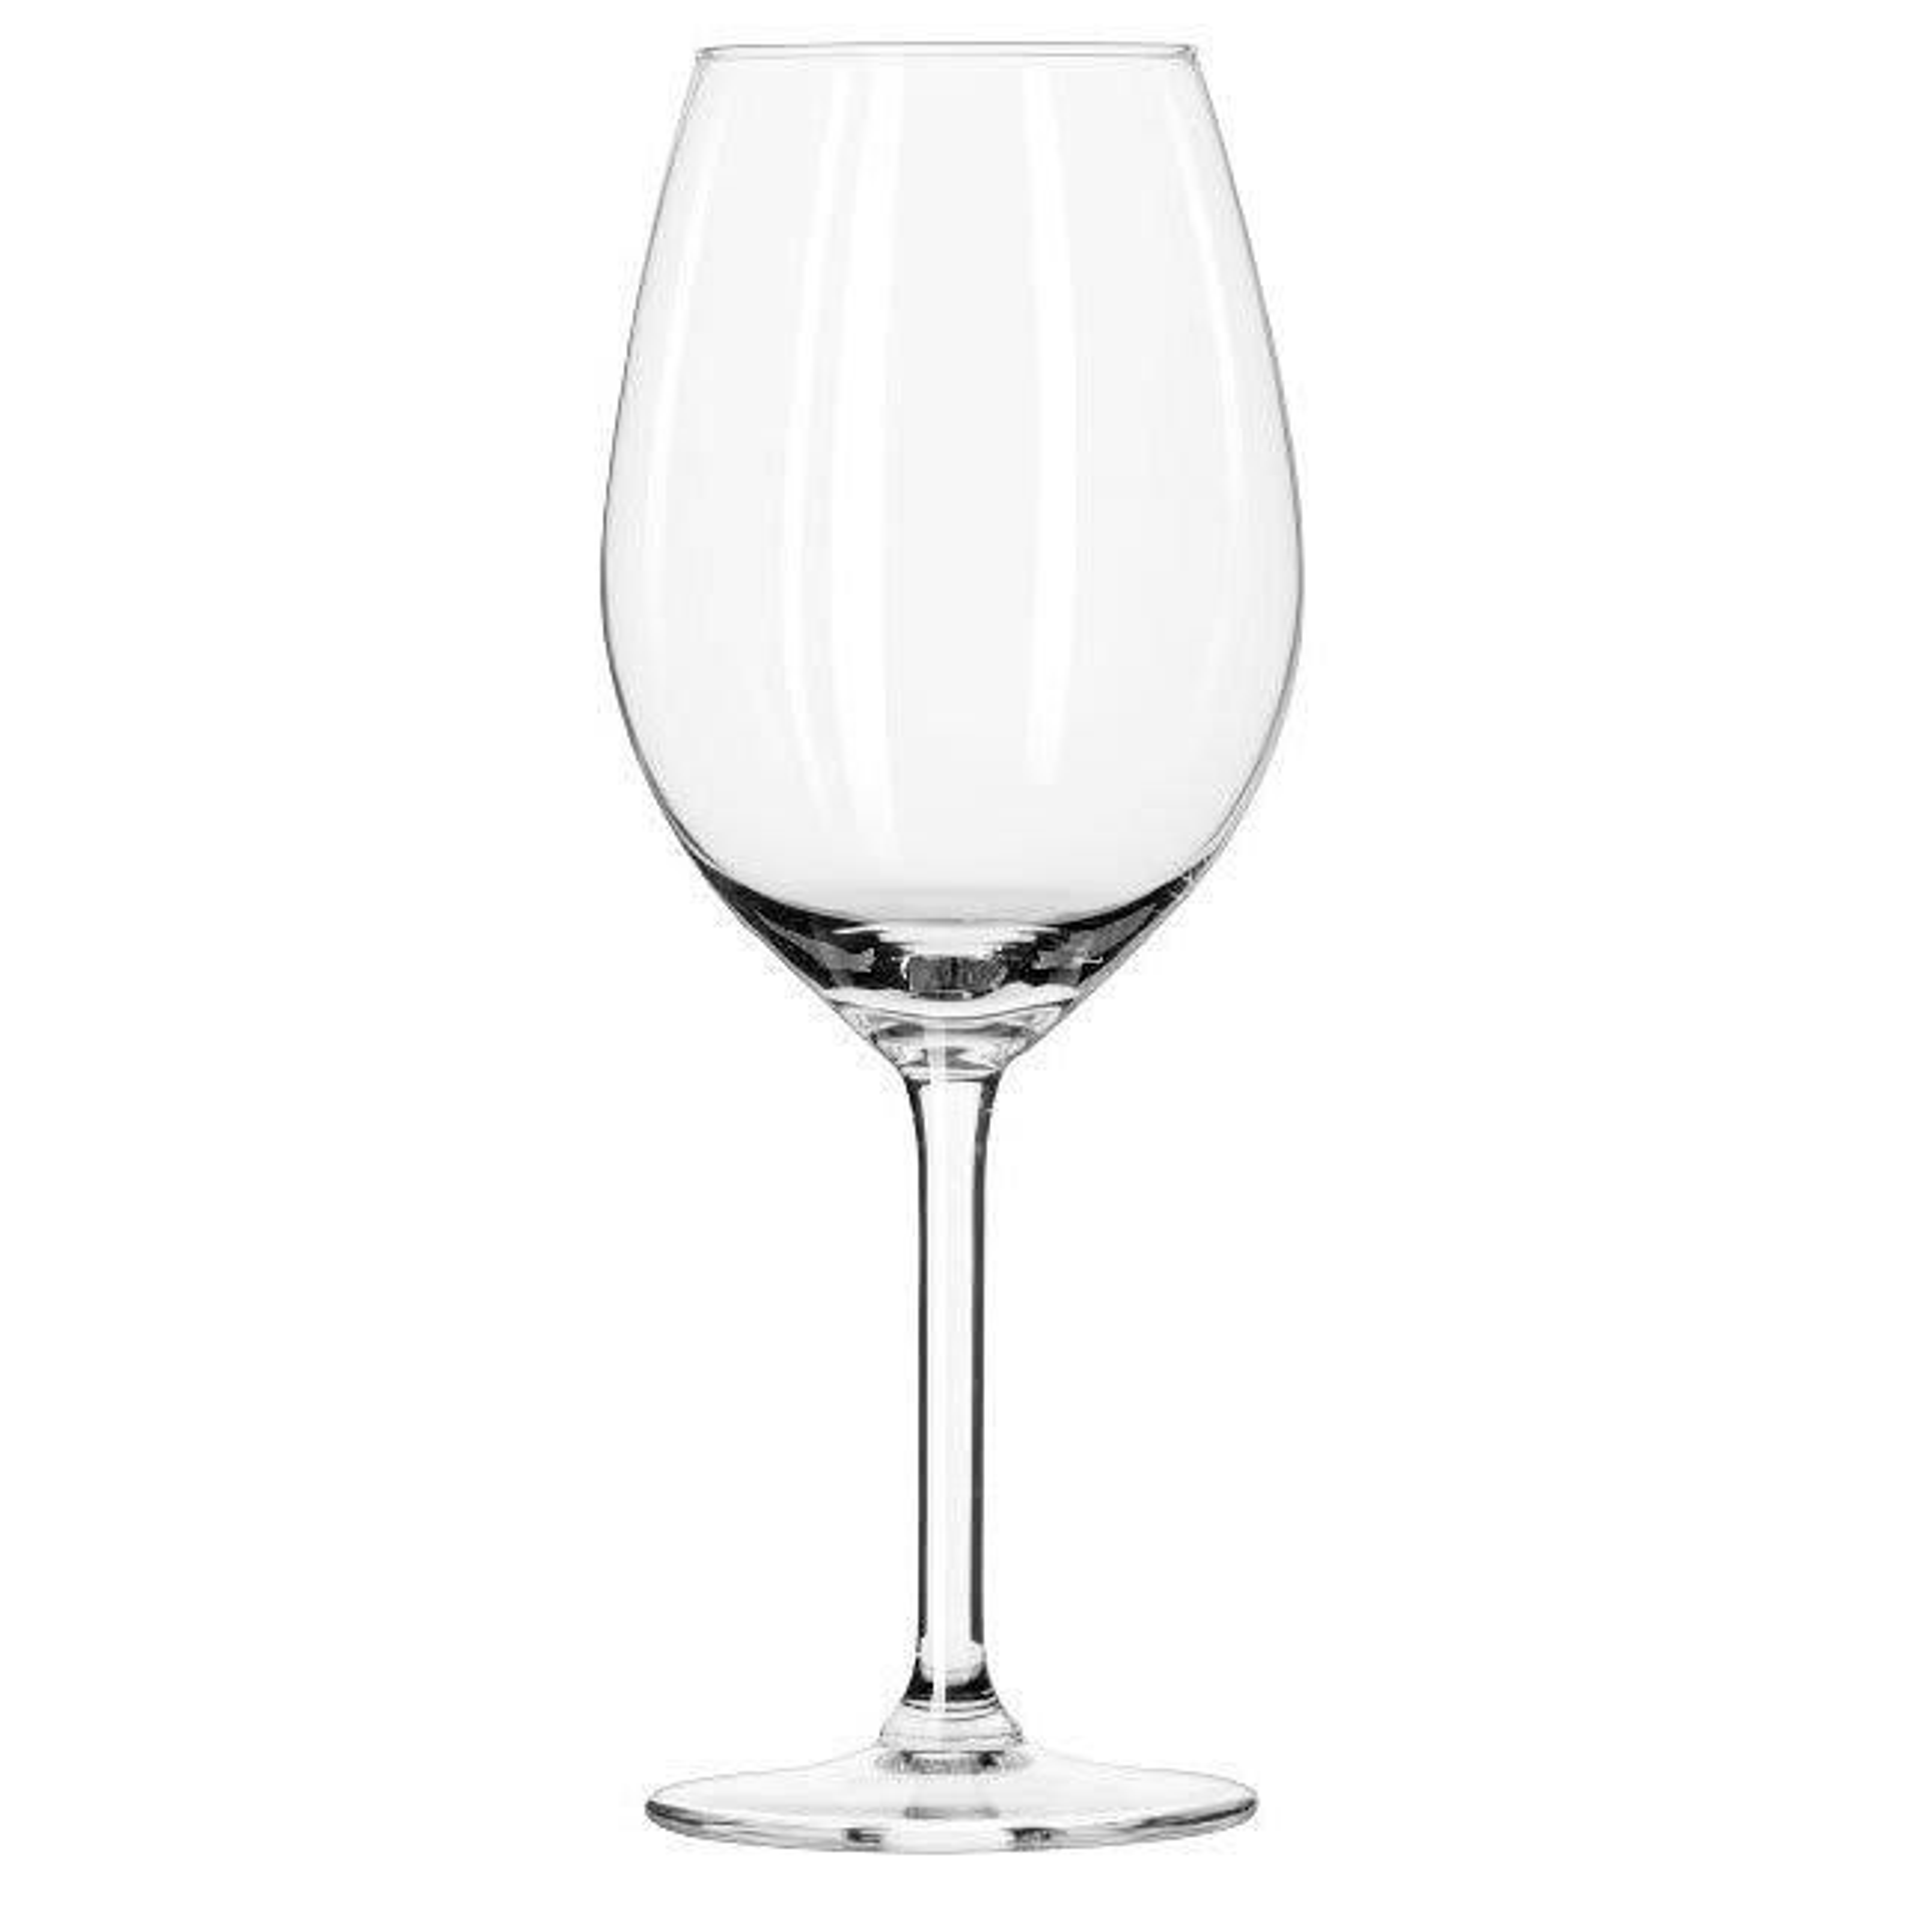 Libbey 9104RL 13.75 oz Allure Royal Leerdam Wine Glass